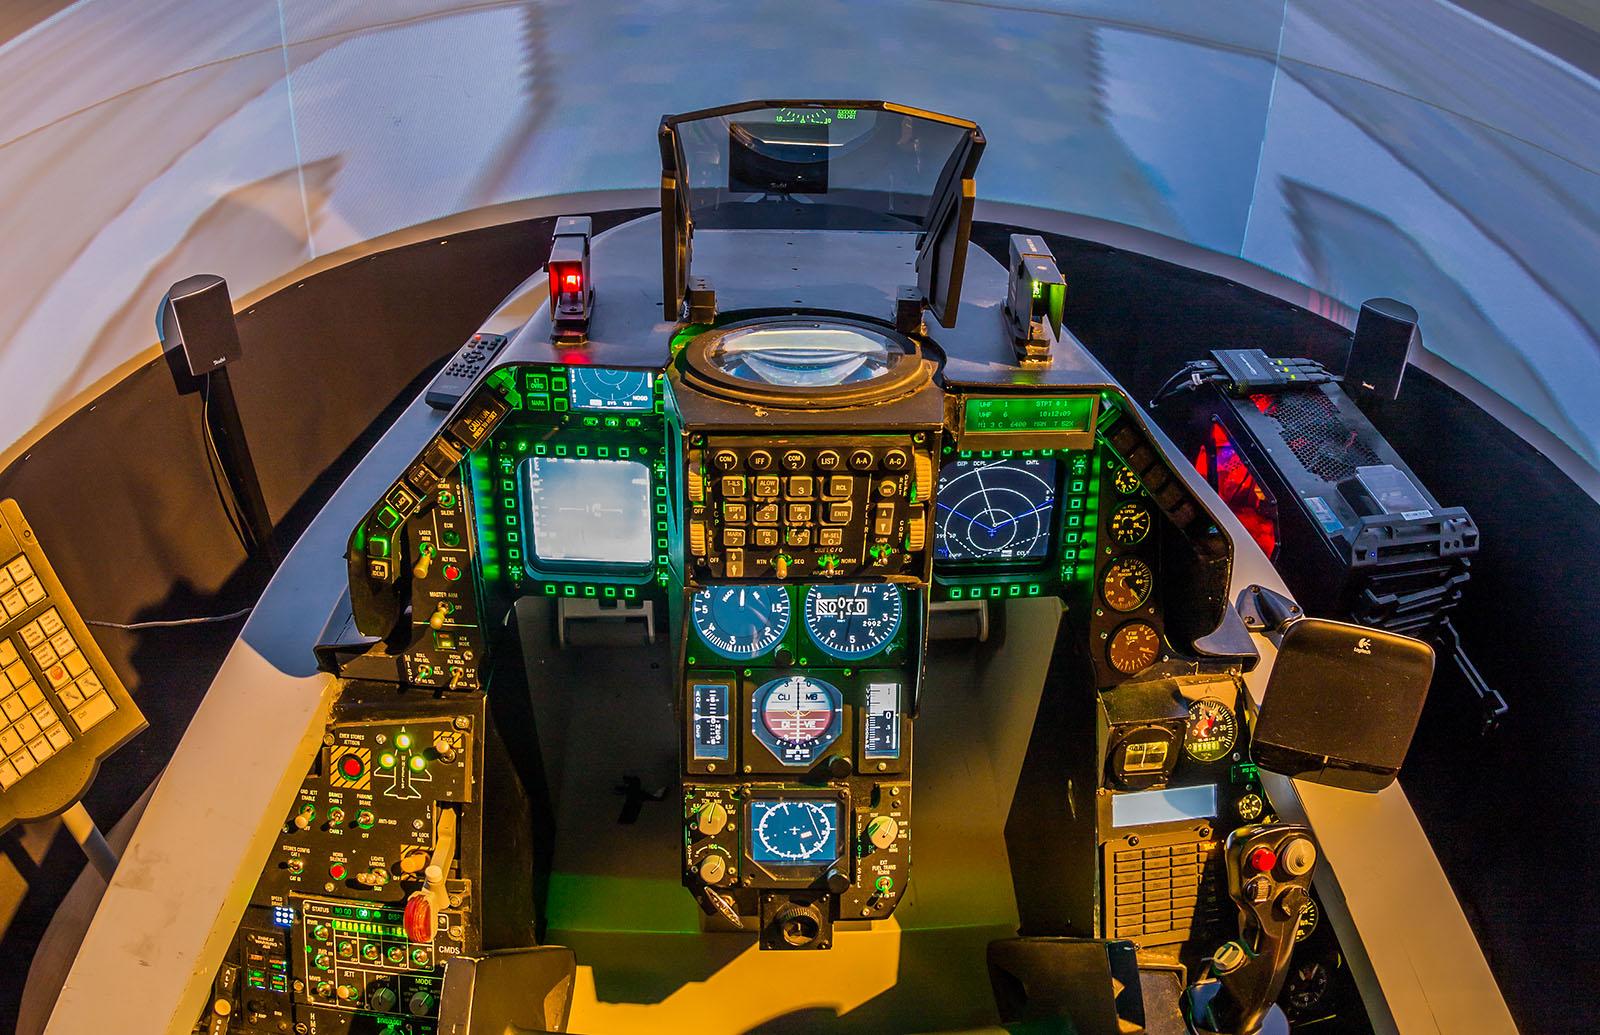 F 16 Kampfjet Flugsimulator In Windeck Flugsimulator